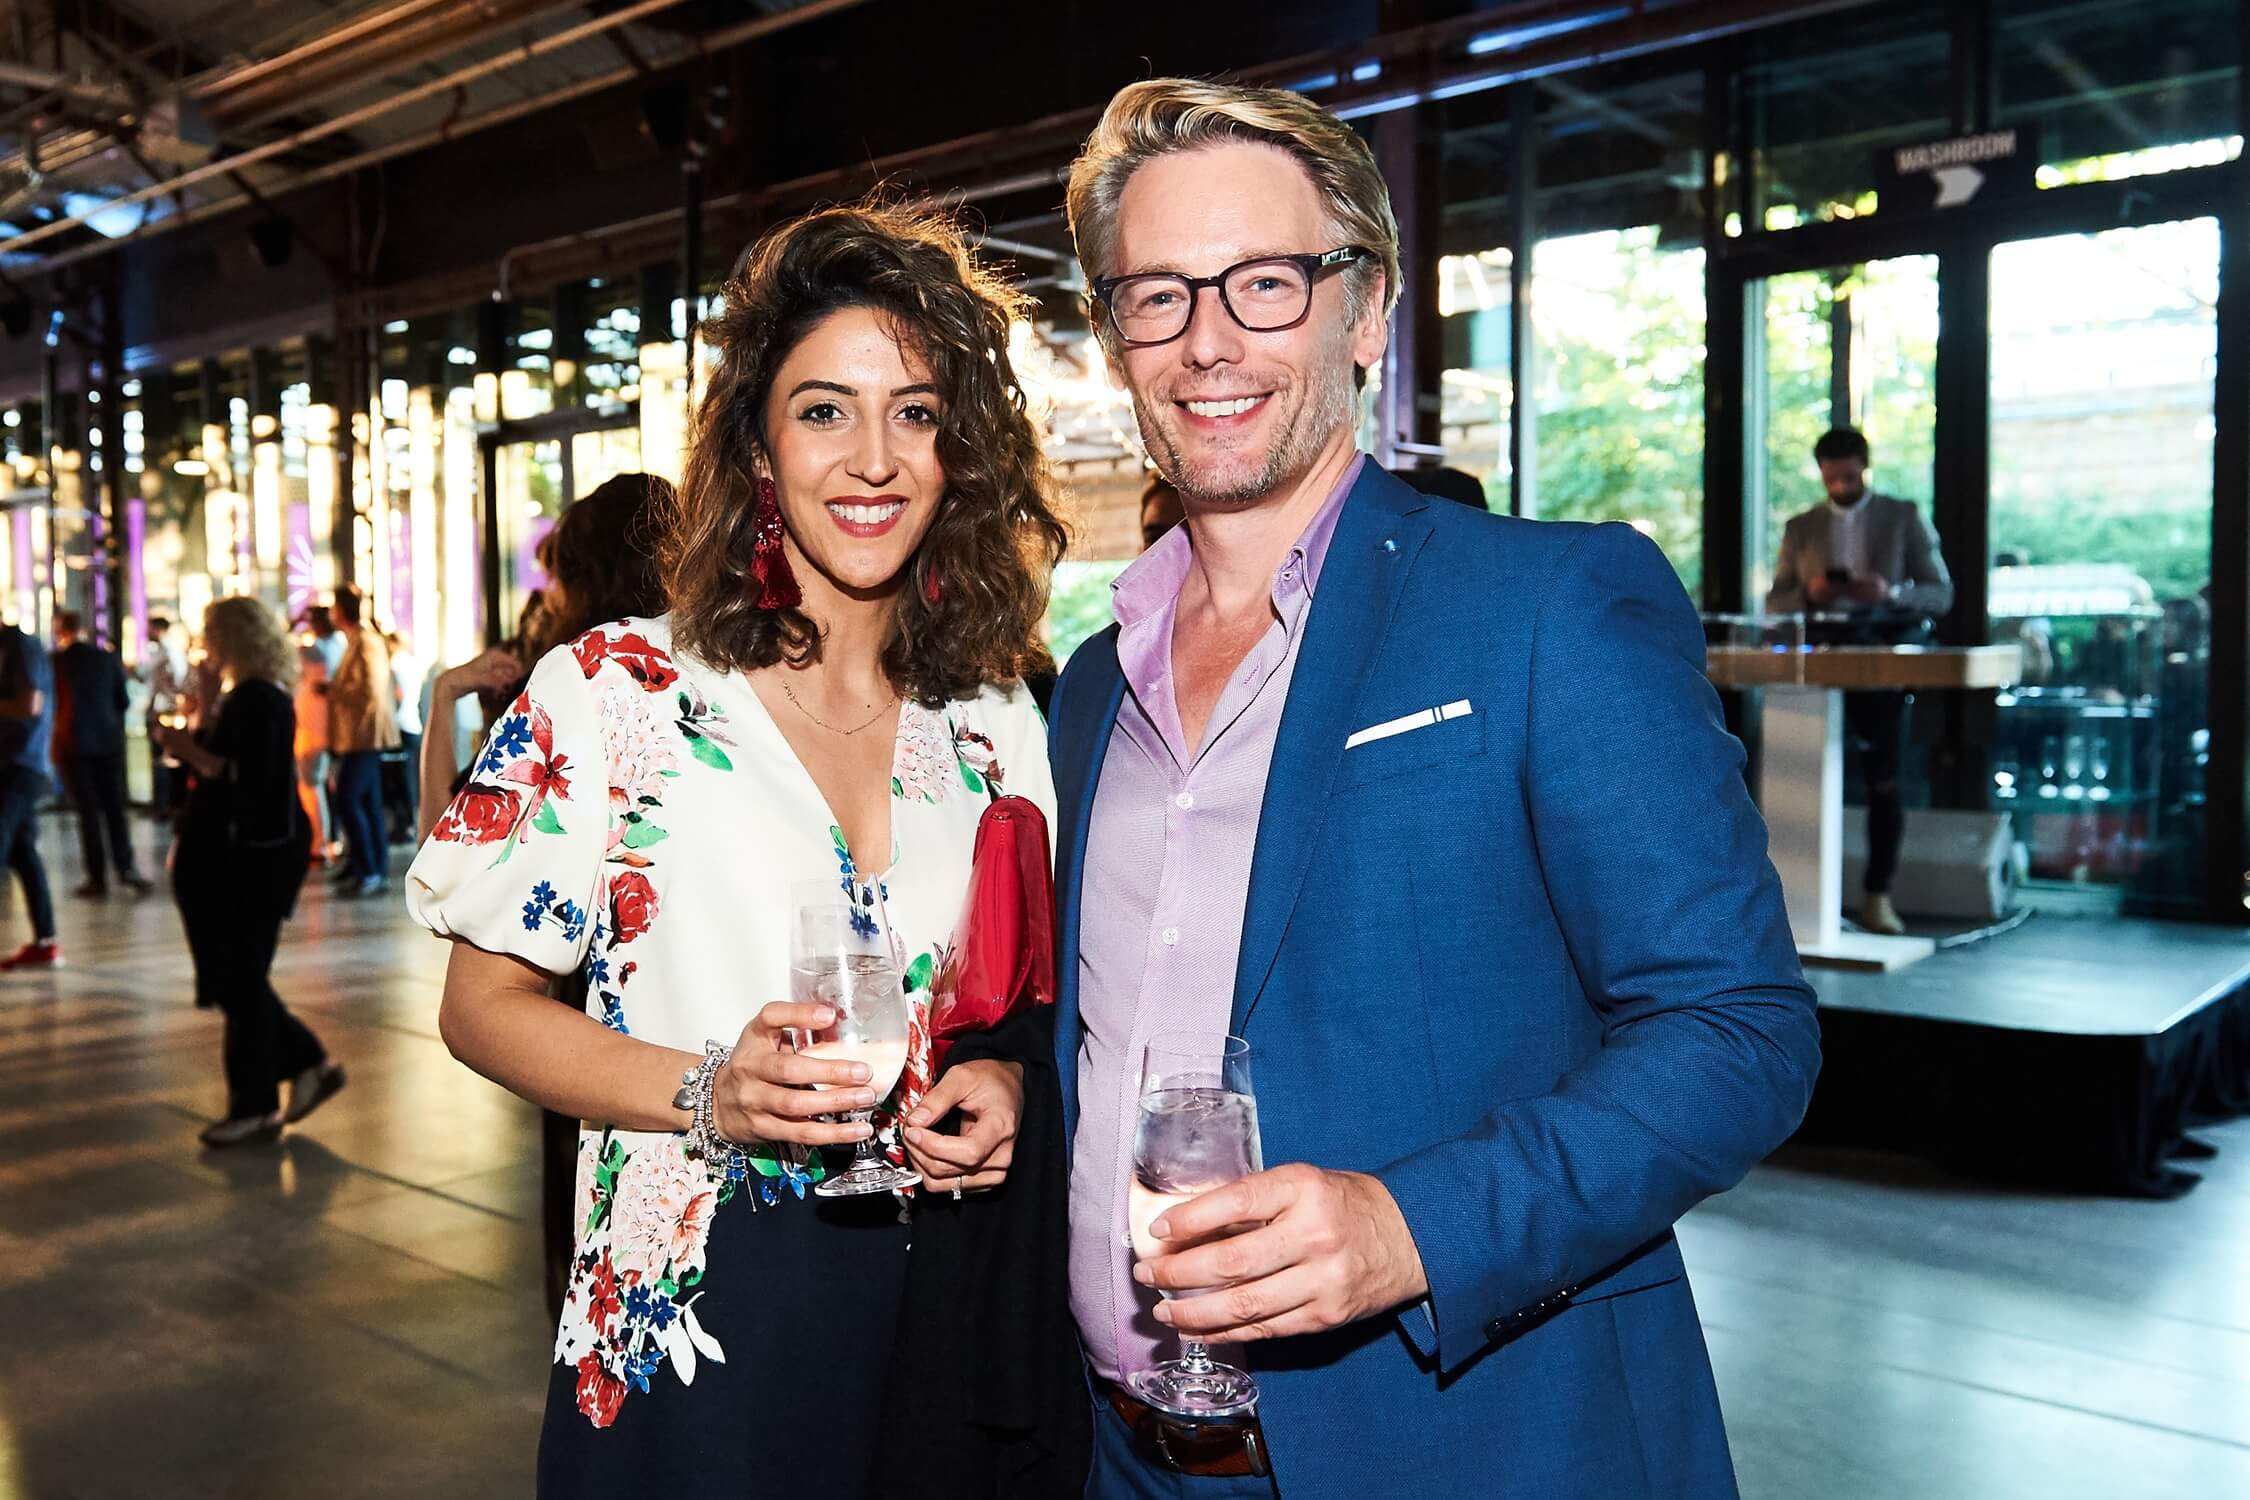 Interior designer Amanda Radji, left, and guest, AZ Awards 2019: Scenes from the Gala